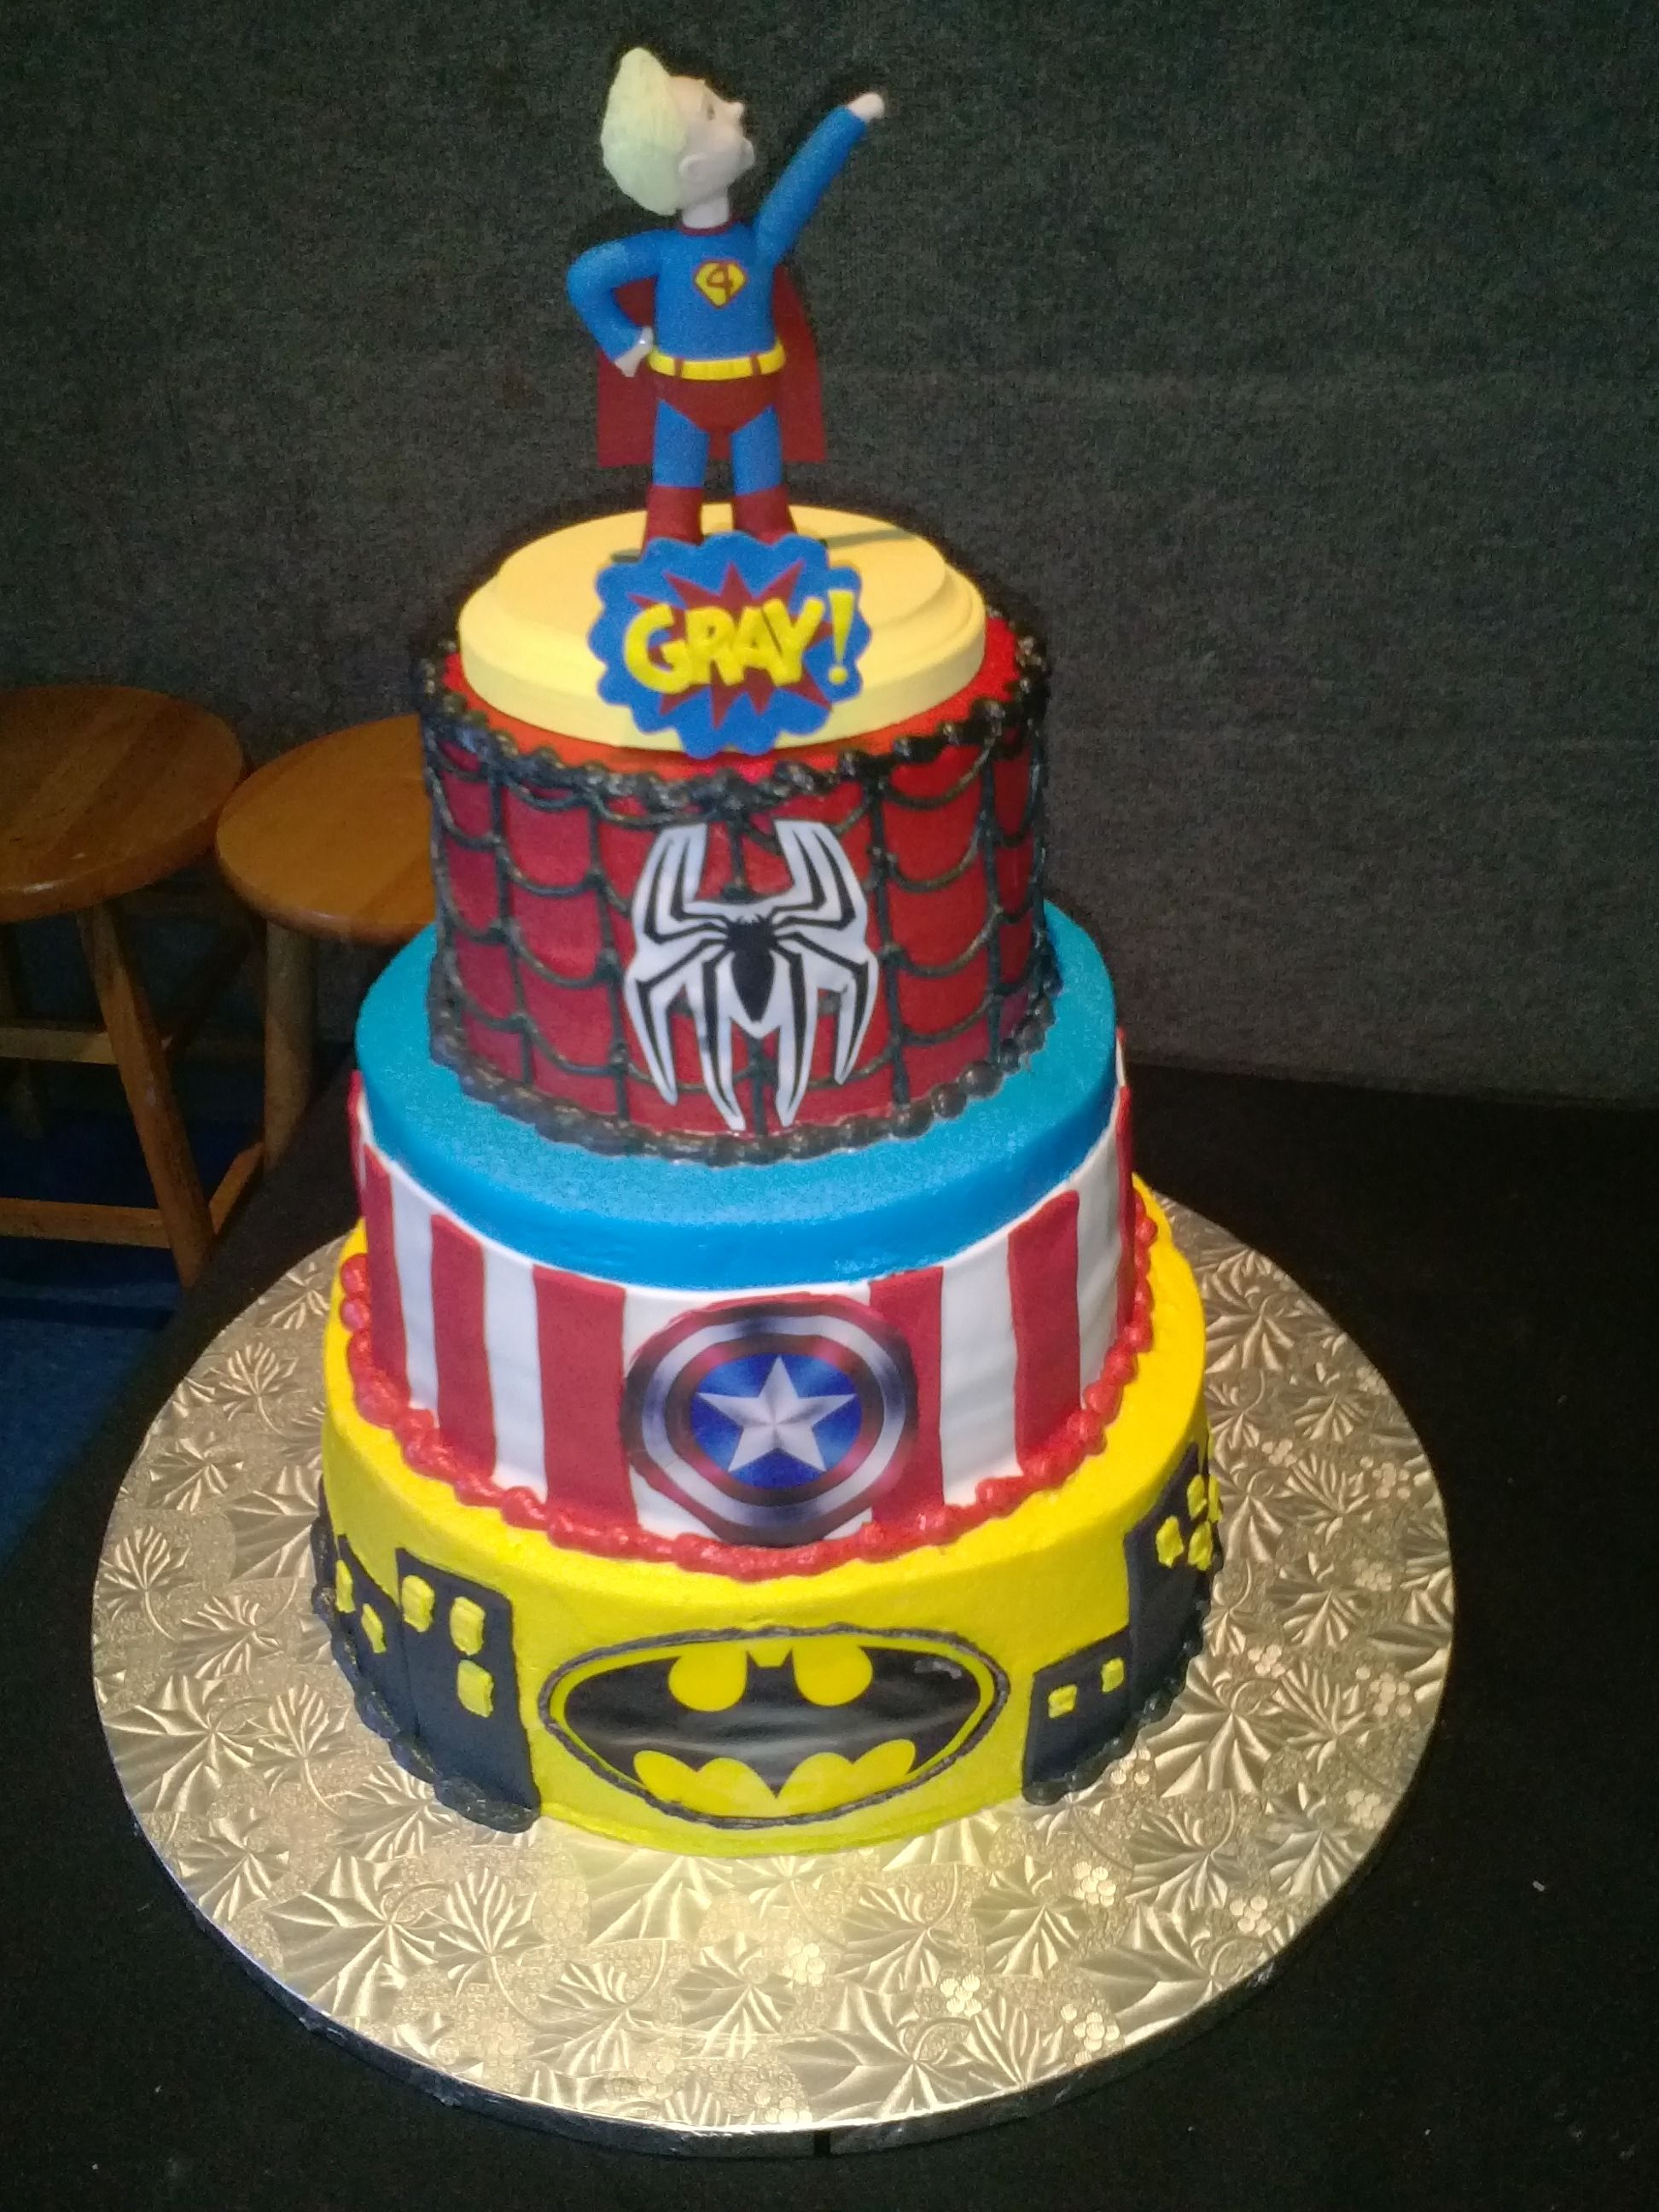 Grays 4th birthday cake superhero birthday cake 4th